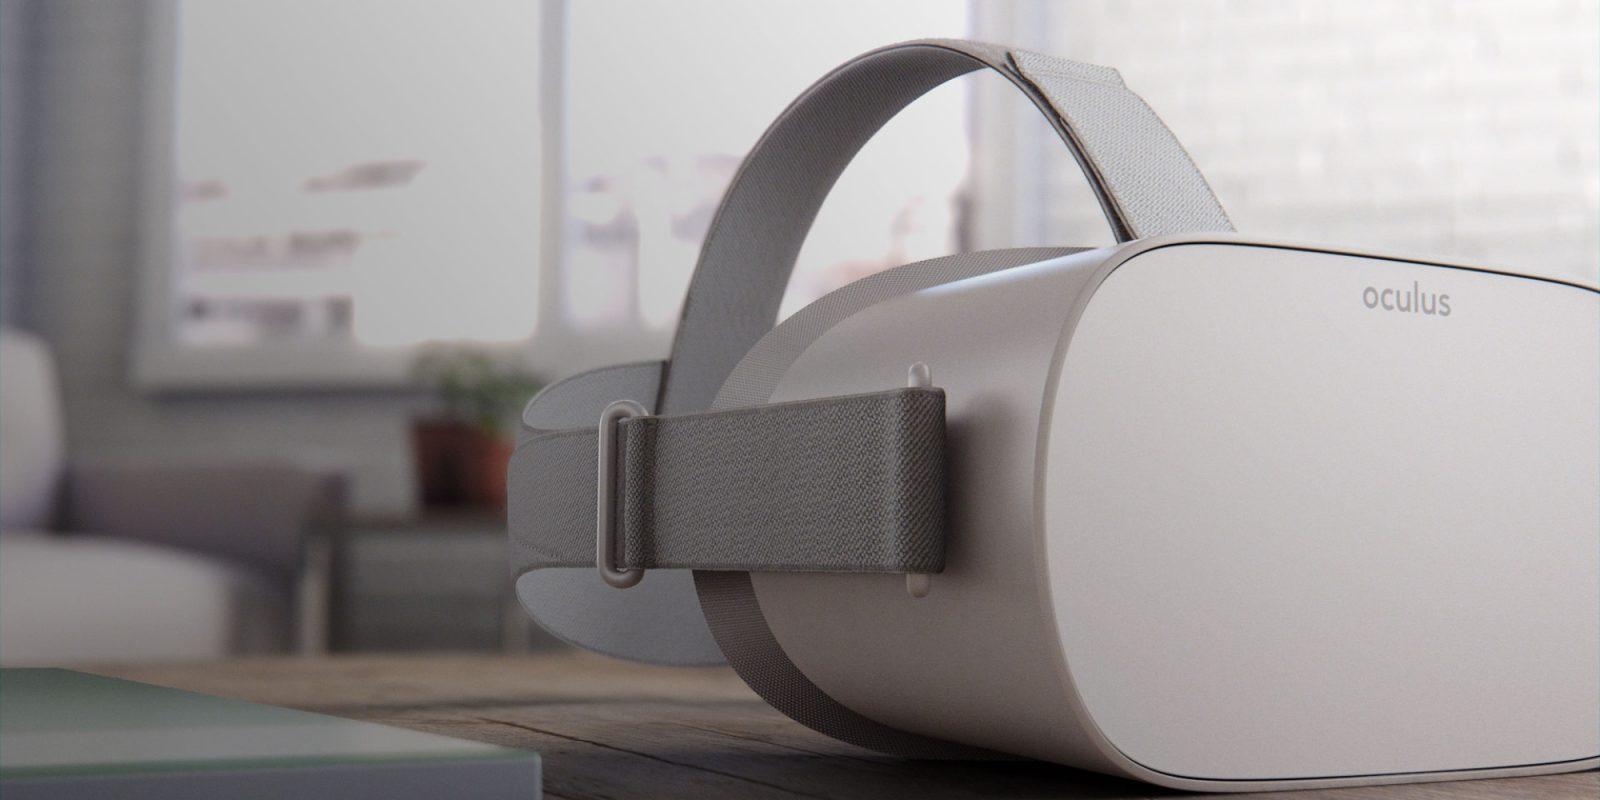 Sling TV lands on Oculus Go's massive 180-inch TV experience